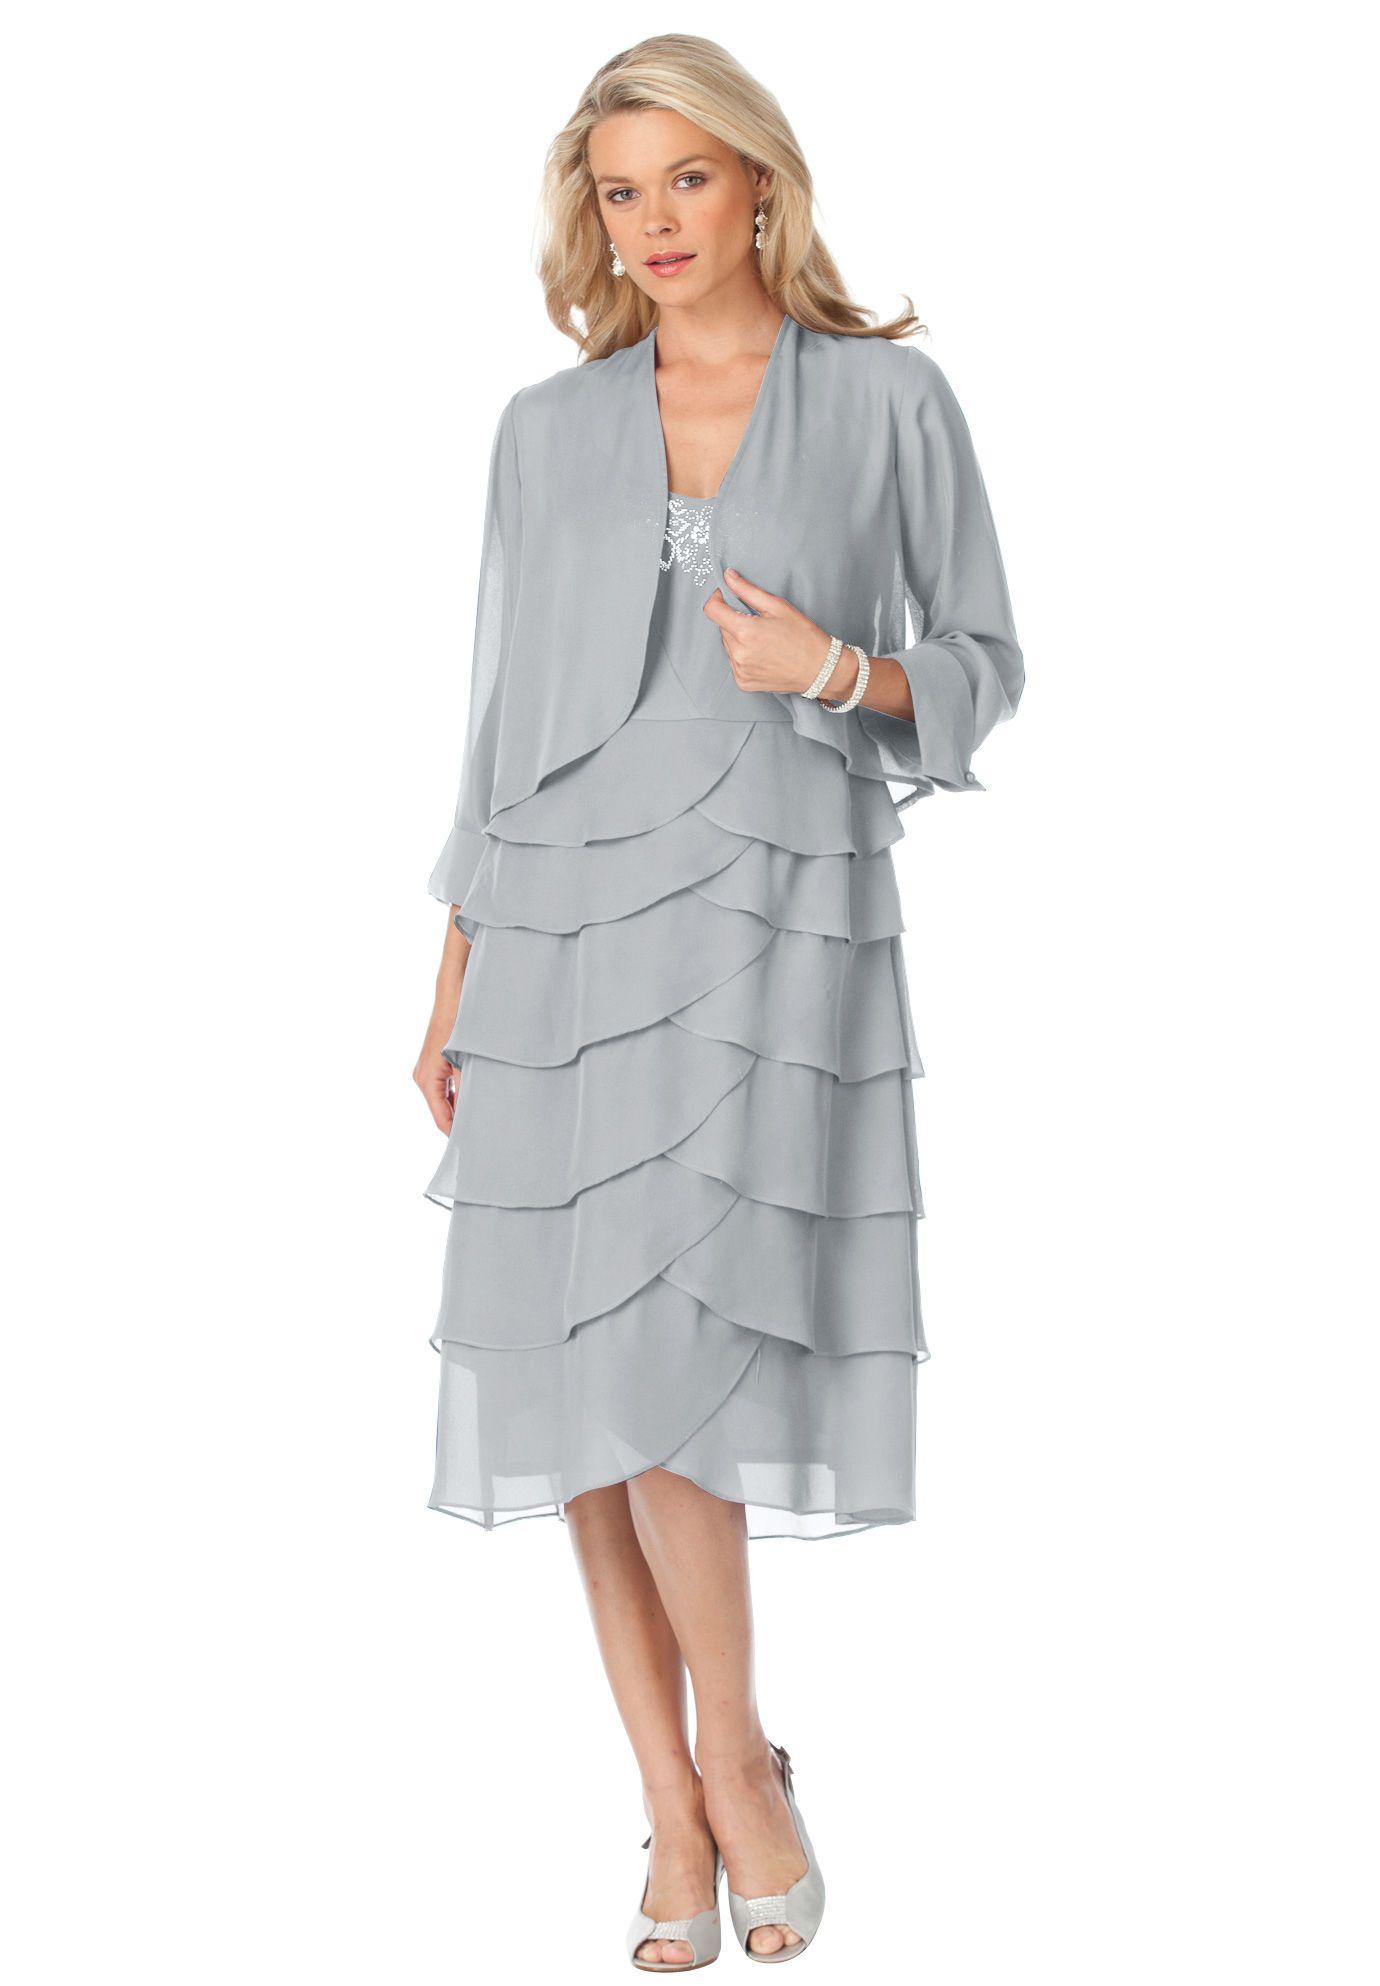 Plus Size Tiered Dress With Jacket – DACC